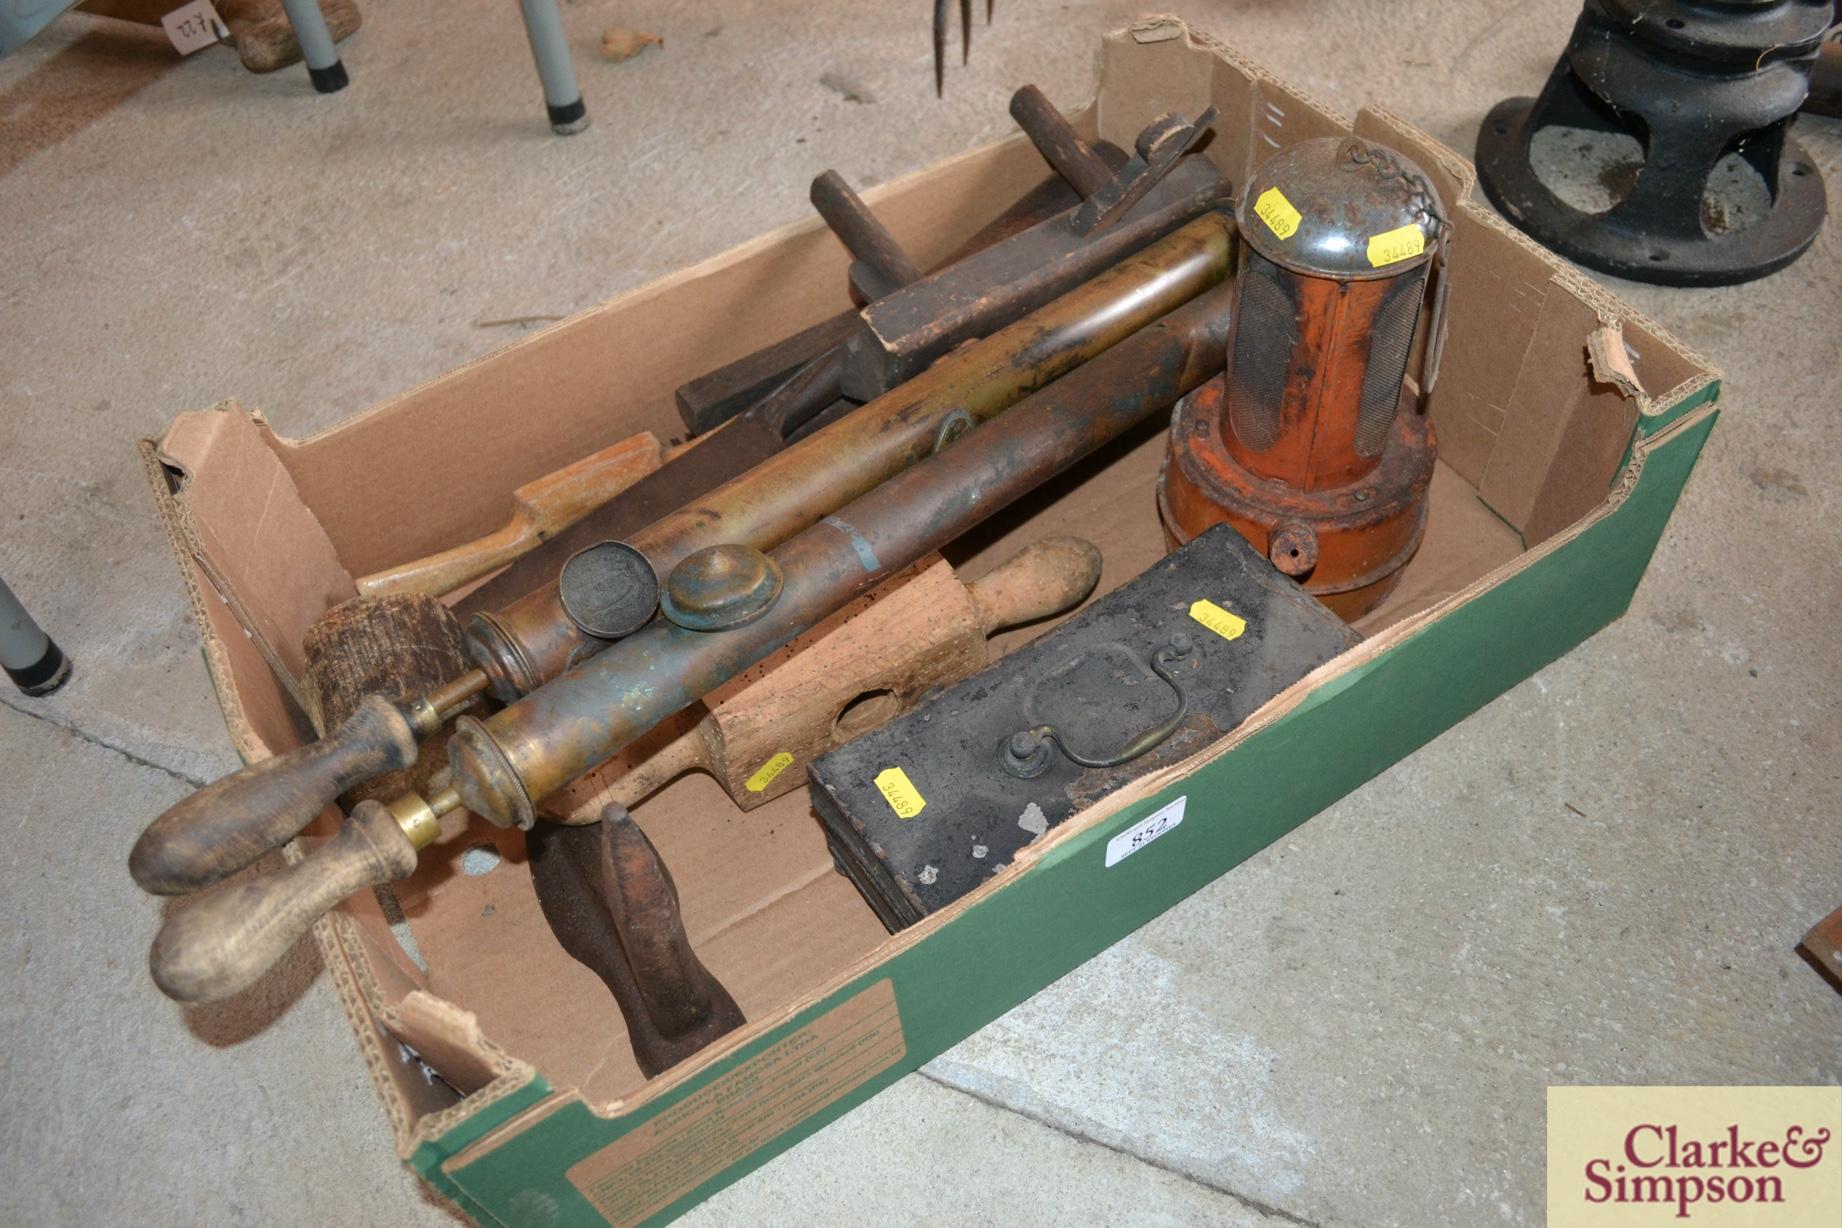 Two vintage brass garden sprayers, a cast iron last,